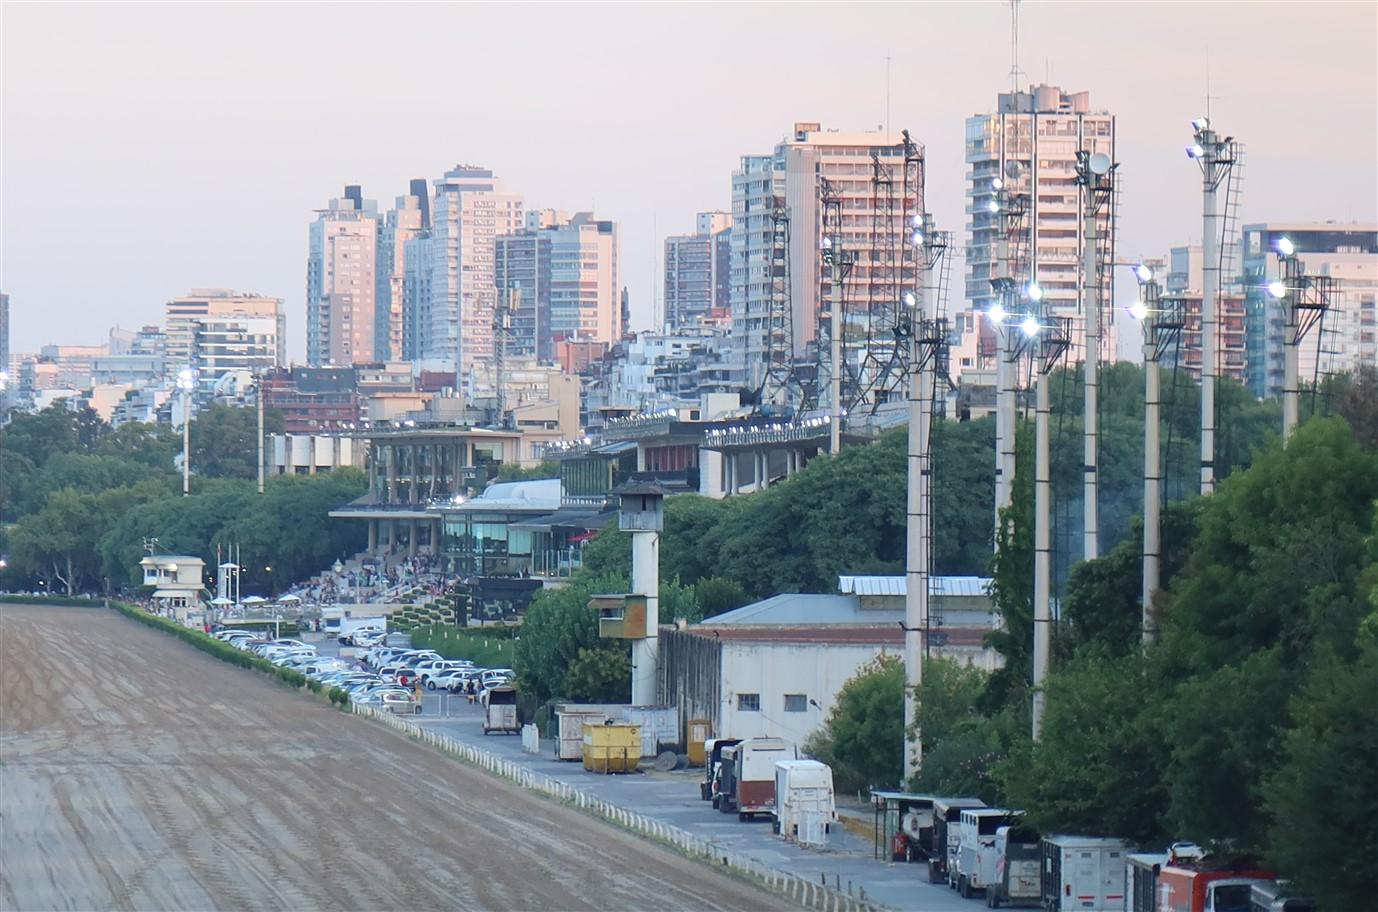 2020 03 07 334 Buenos Aires Hippodromo Palermo.jpg